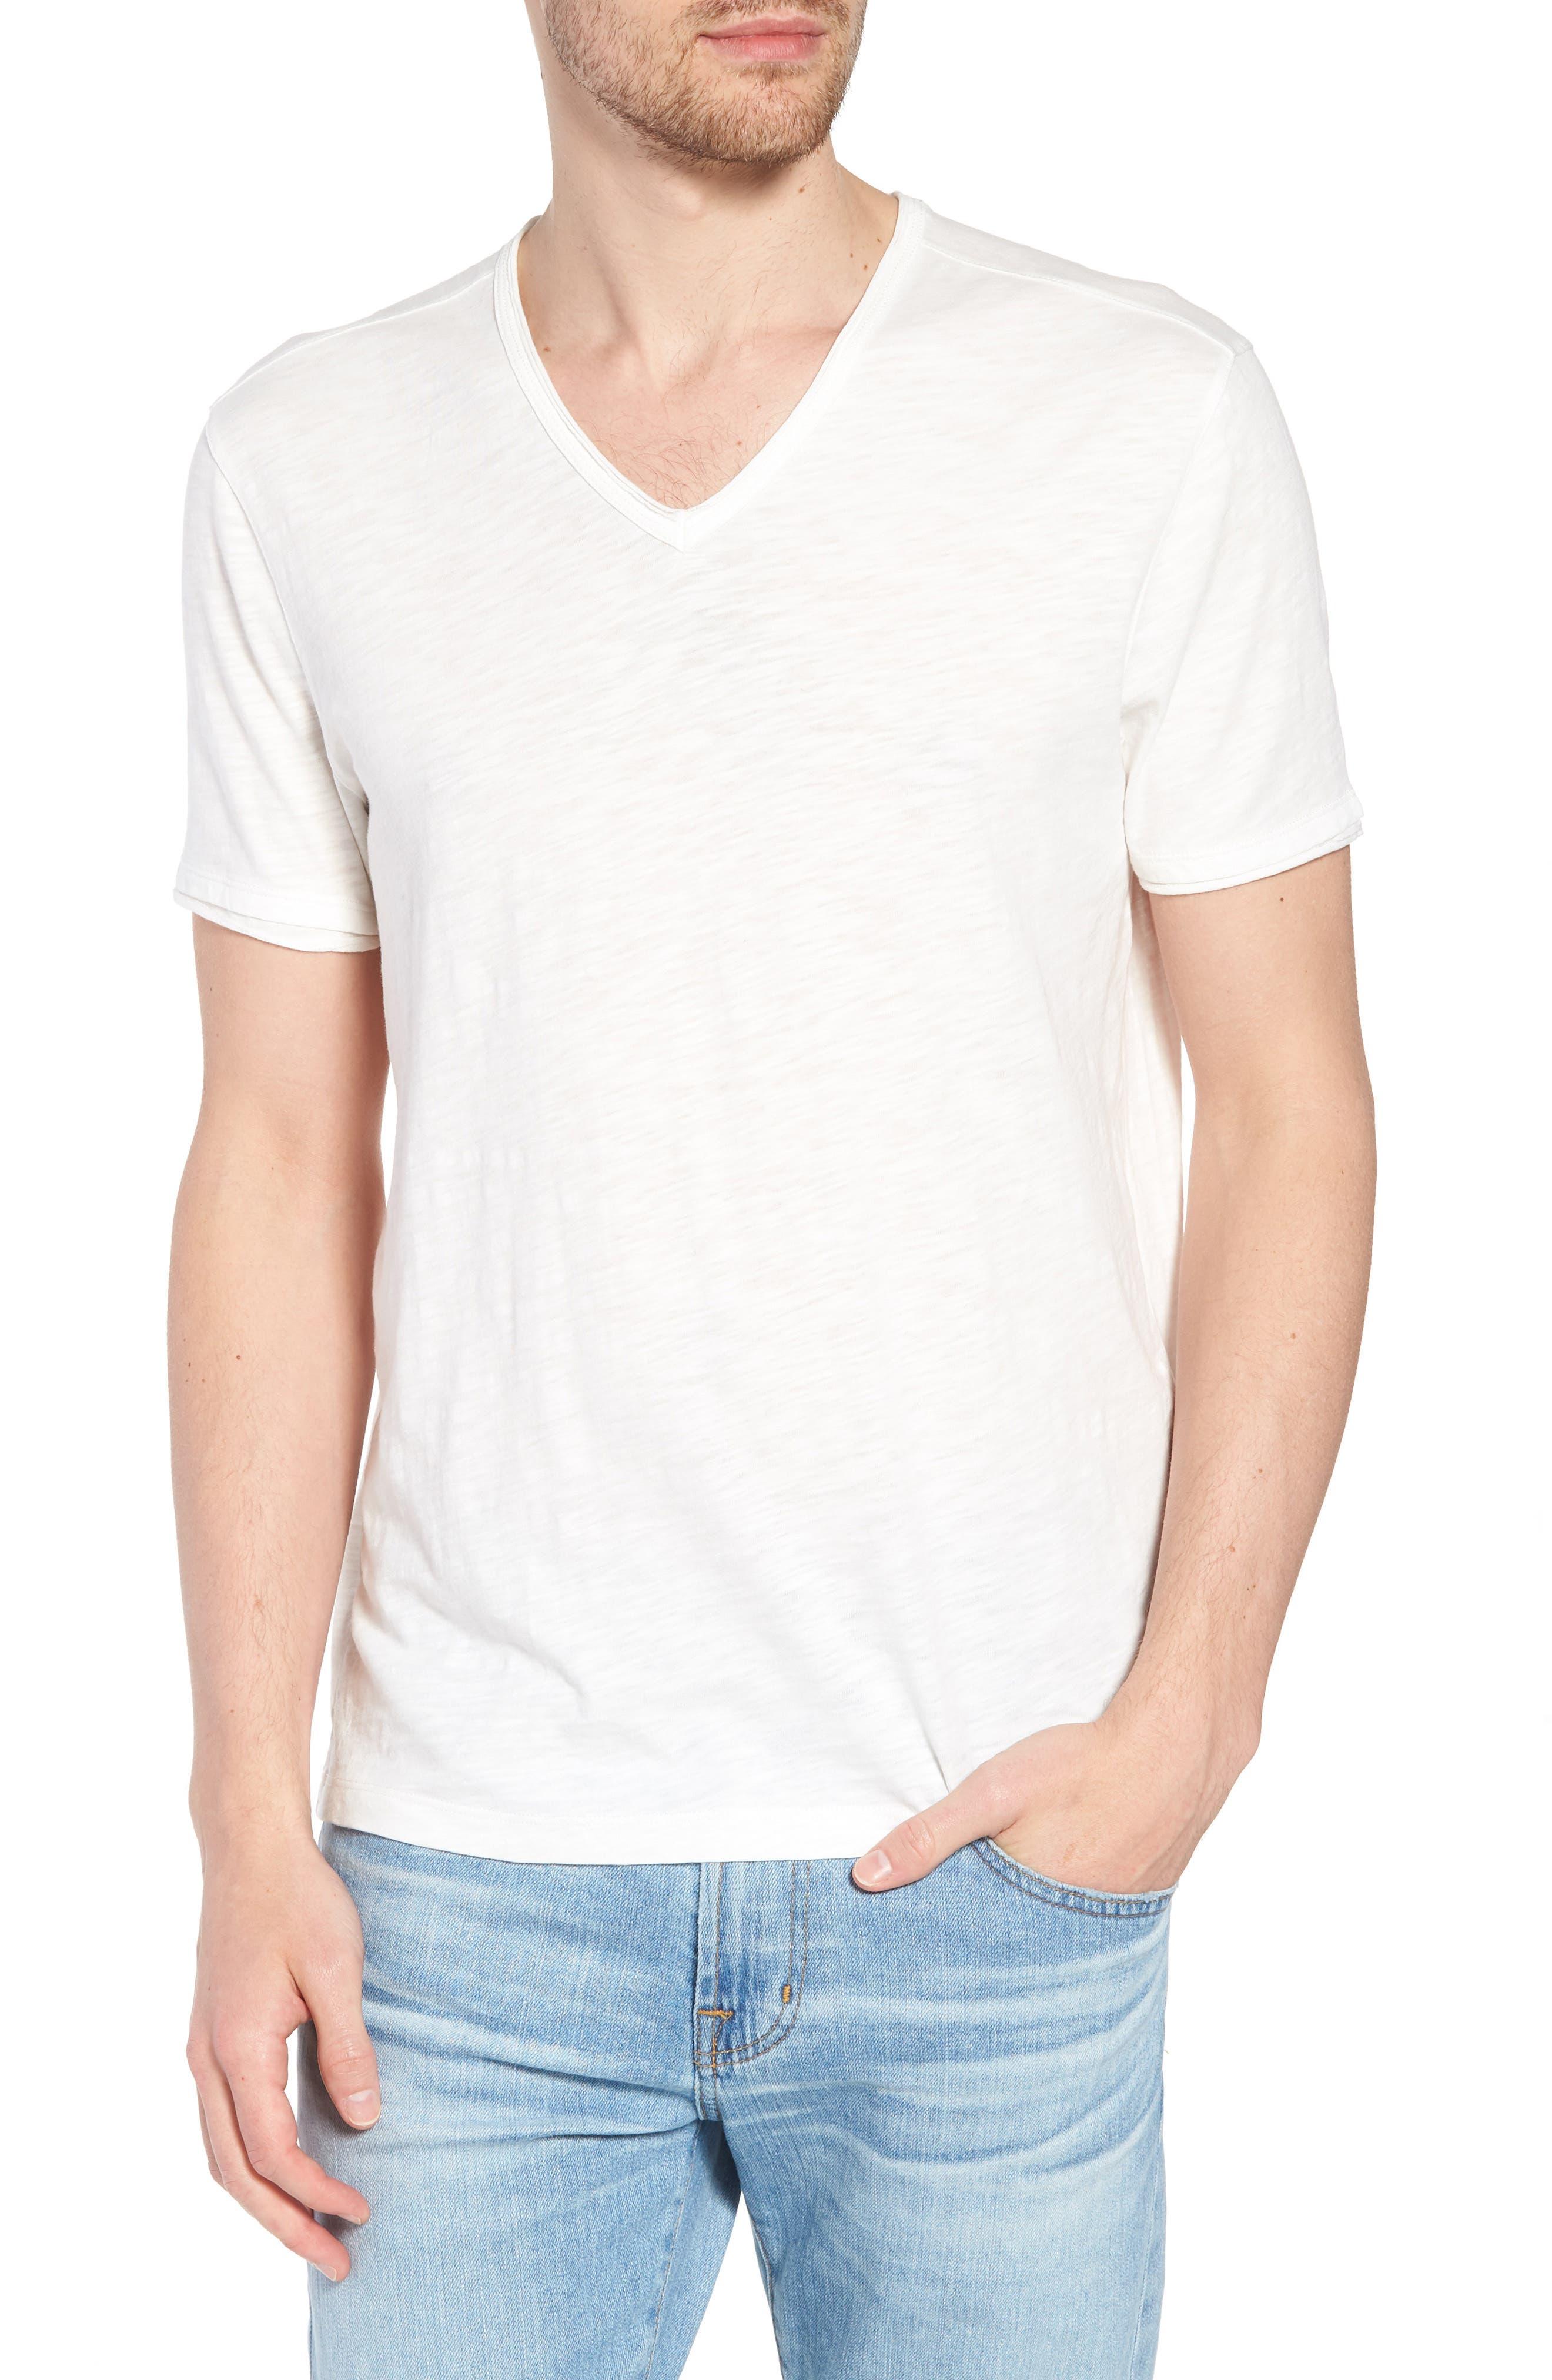 Star Usa Slim Fit Slubbed V-Neck T-Shirt